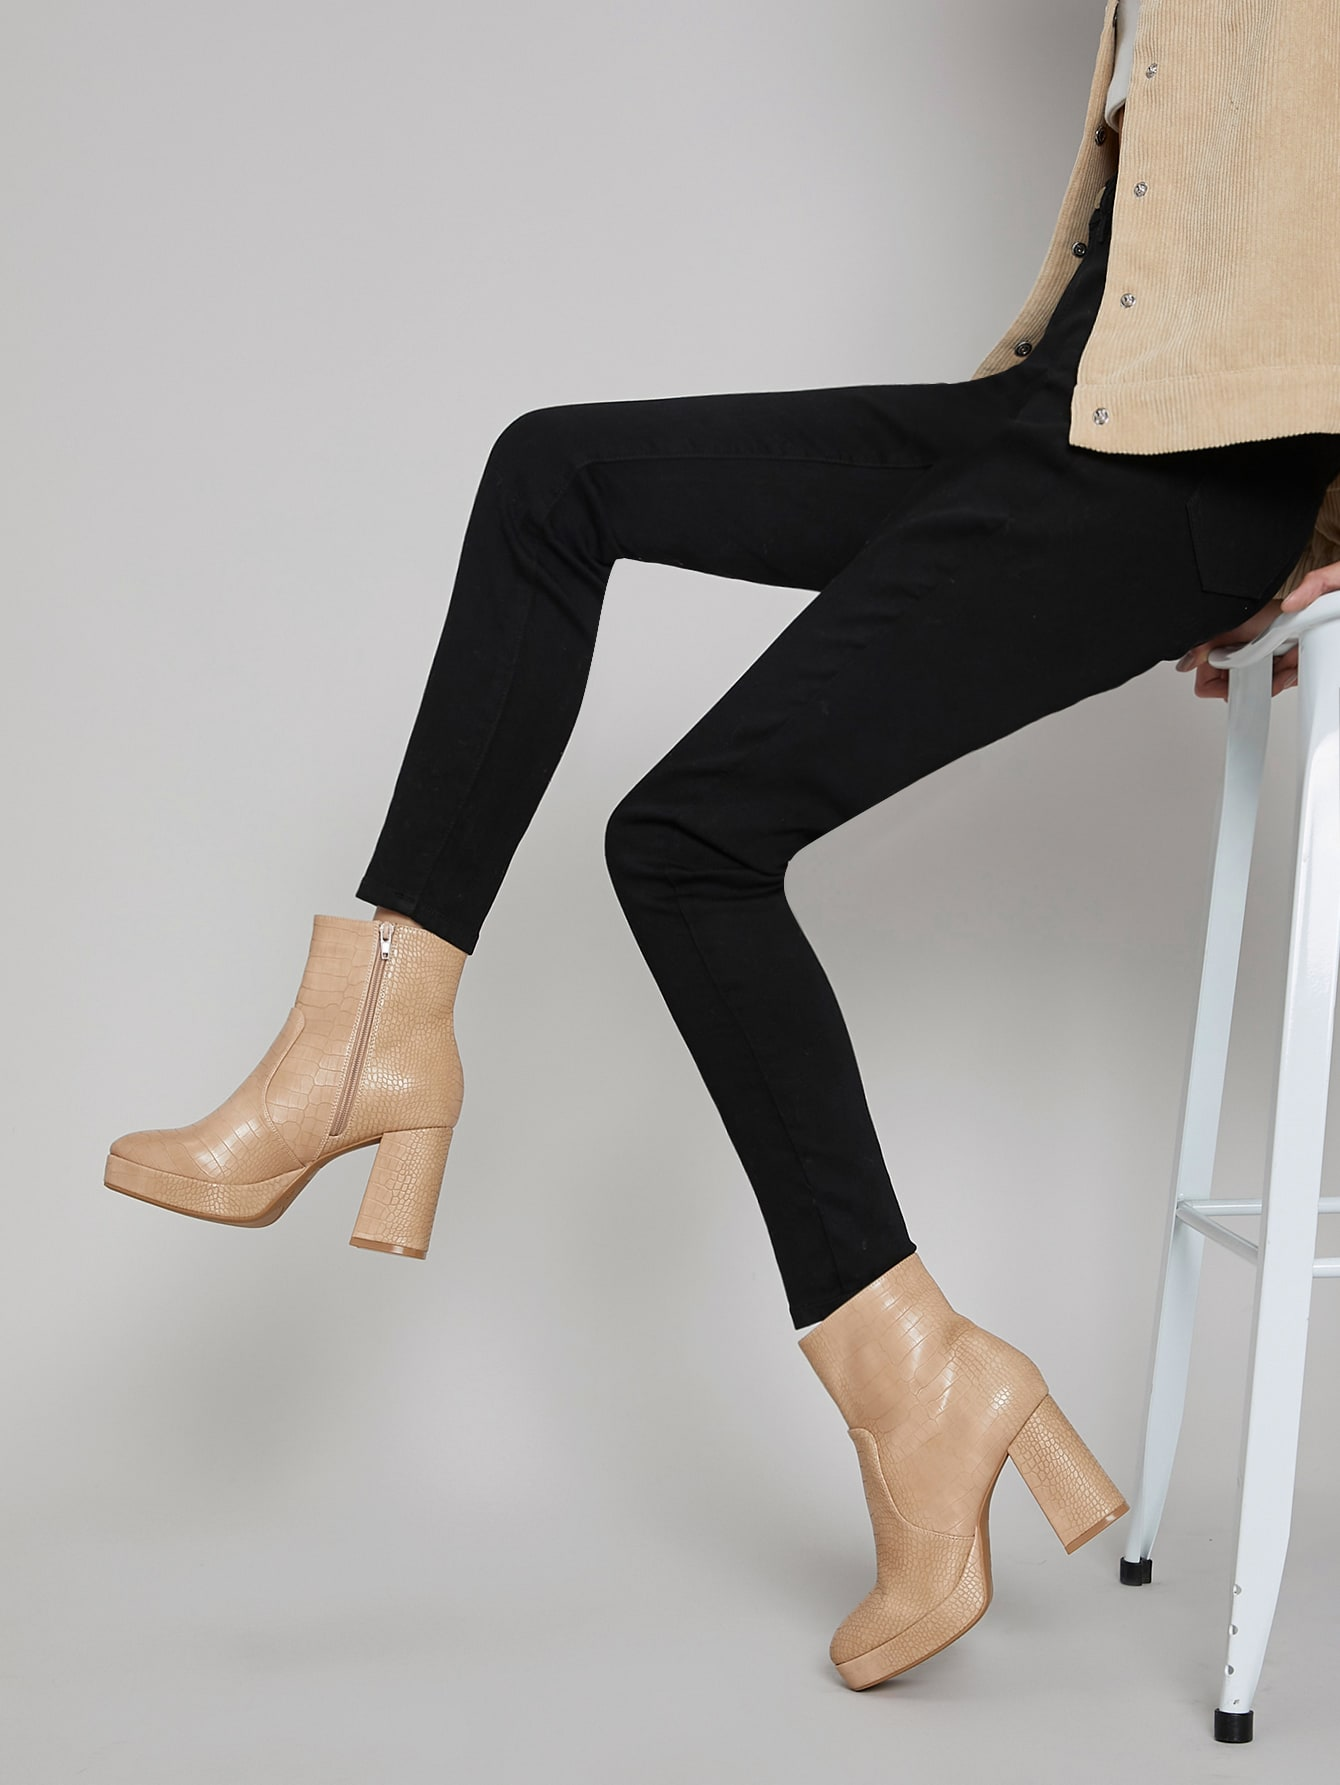 Vegan Croc Leather High Block Heel Platform Boots thumbnail